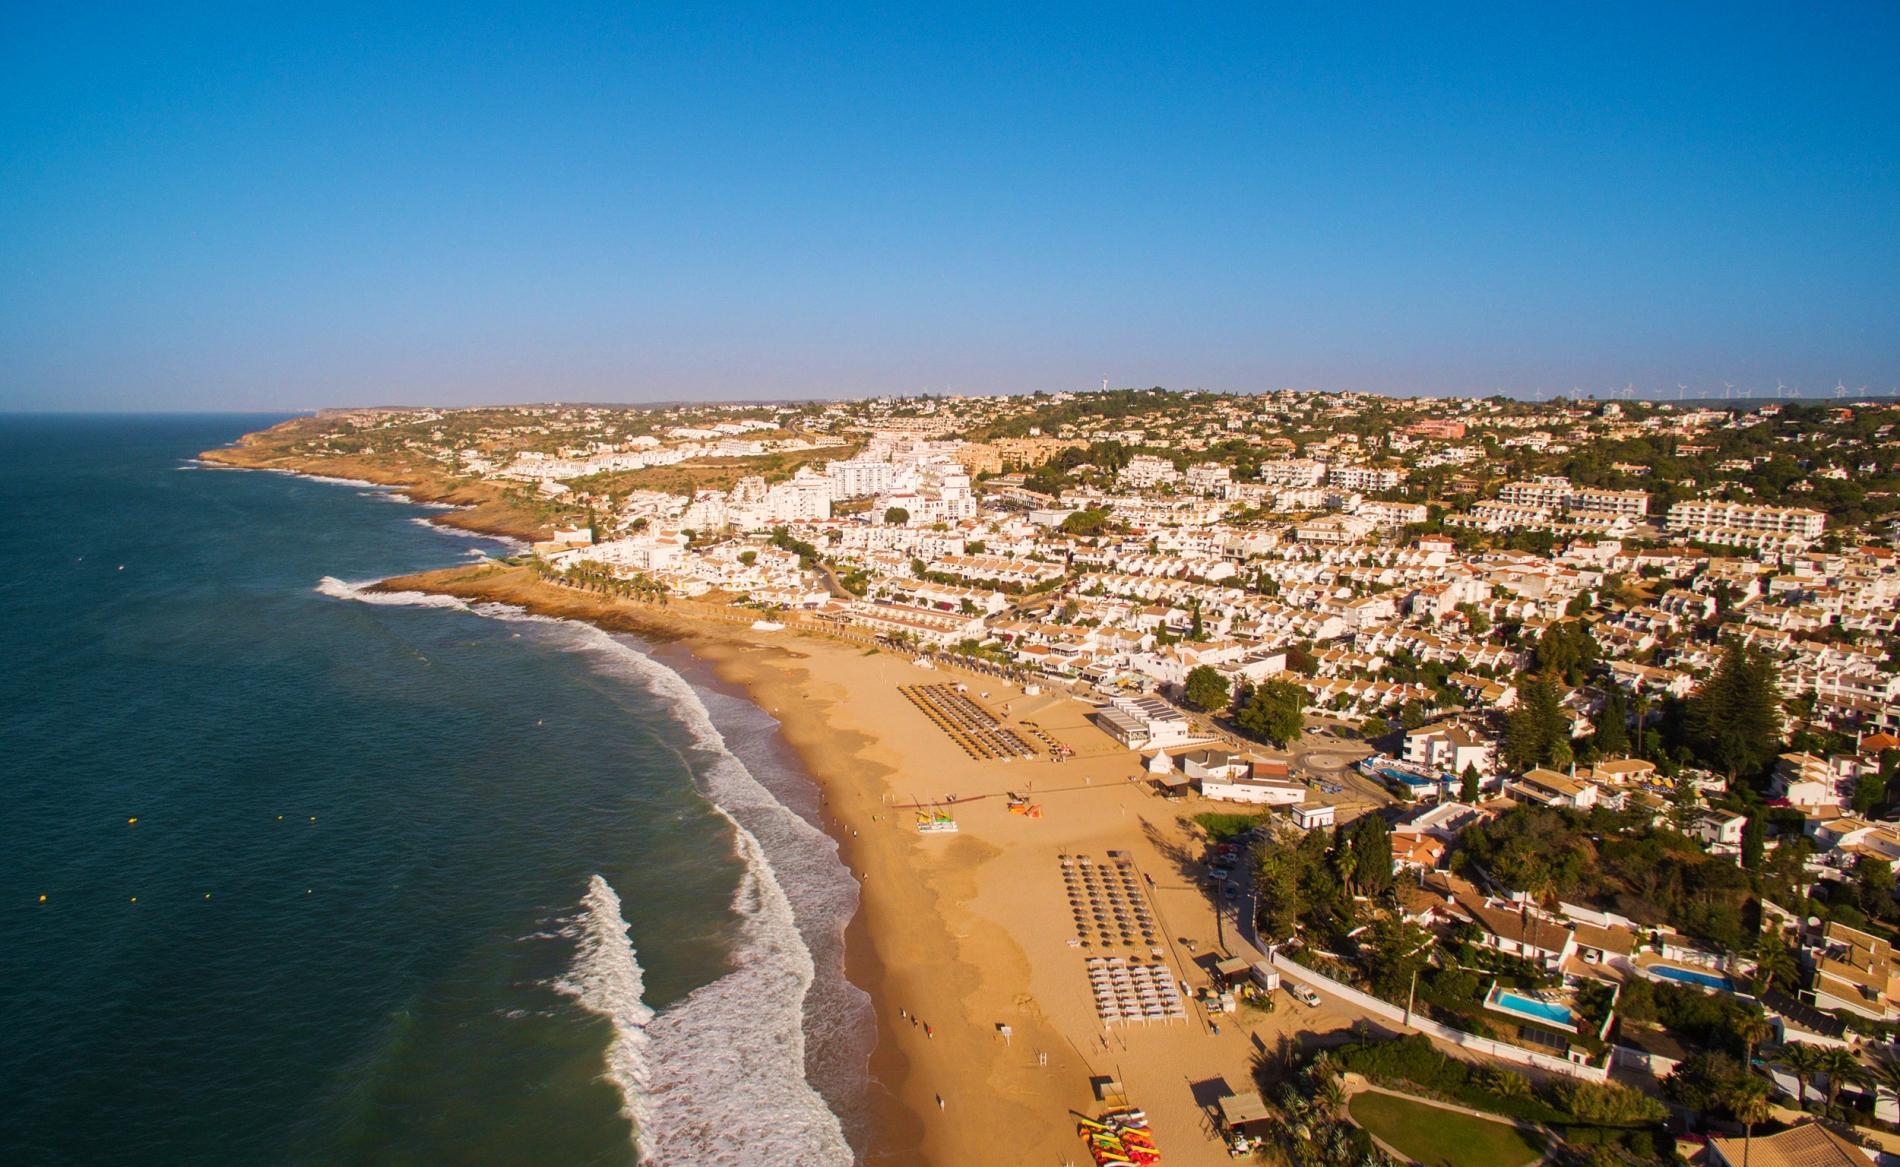 Ferienwohnung A24 - LuzBay Beach Apartment (2558091), Luz, , Algarve, Portugal, Bild 39